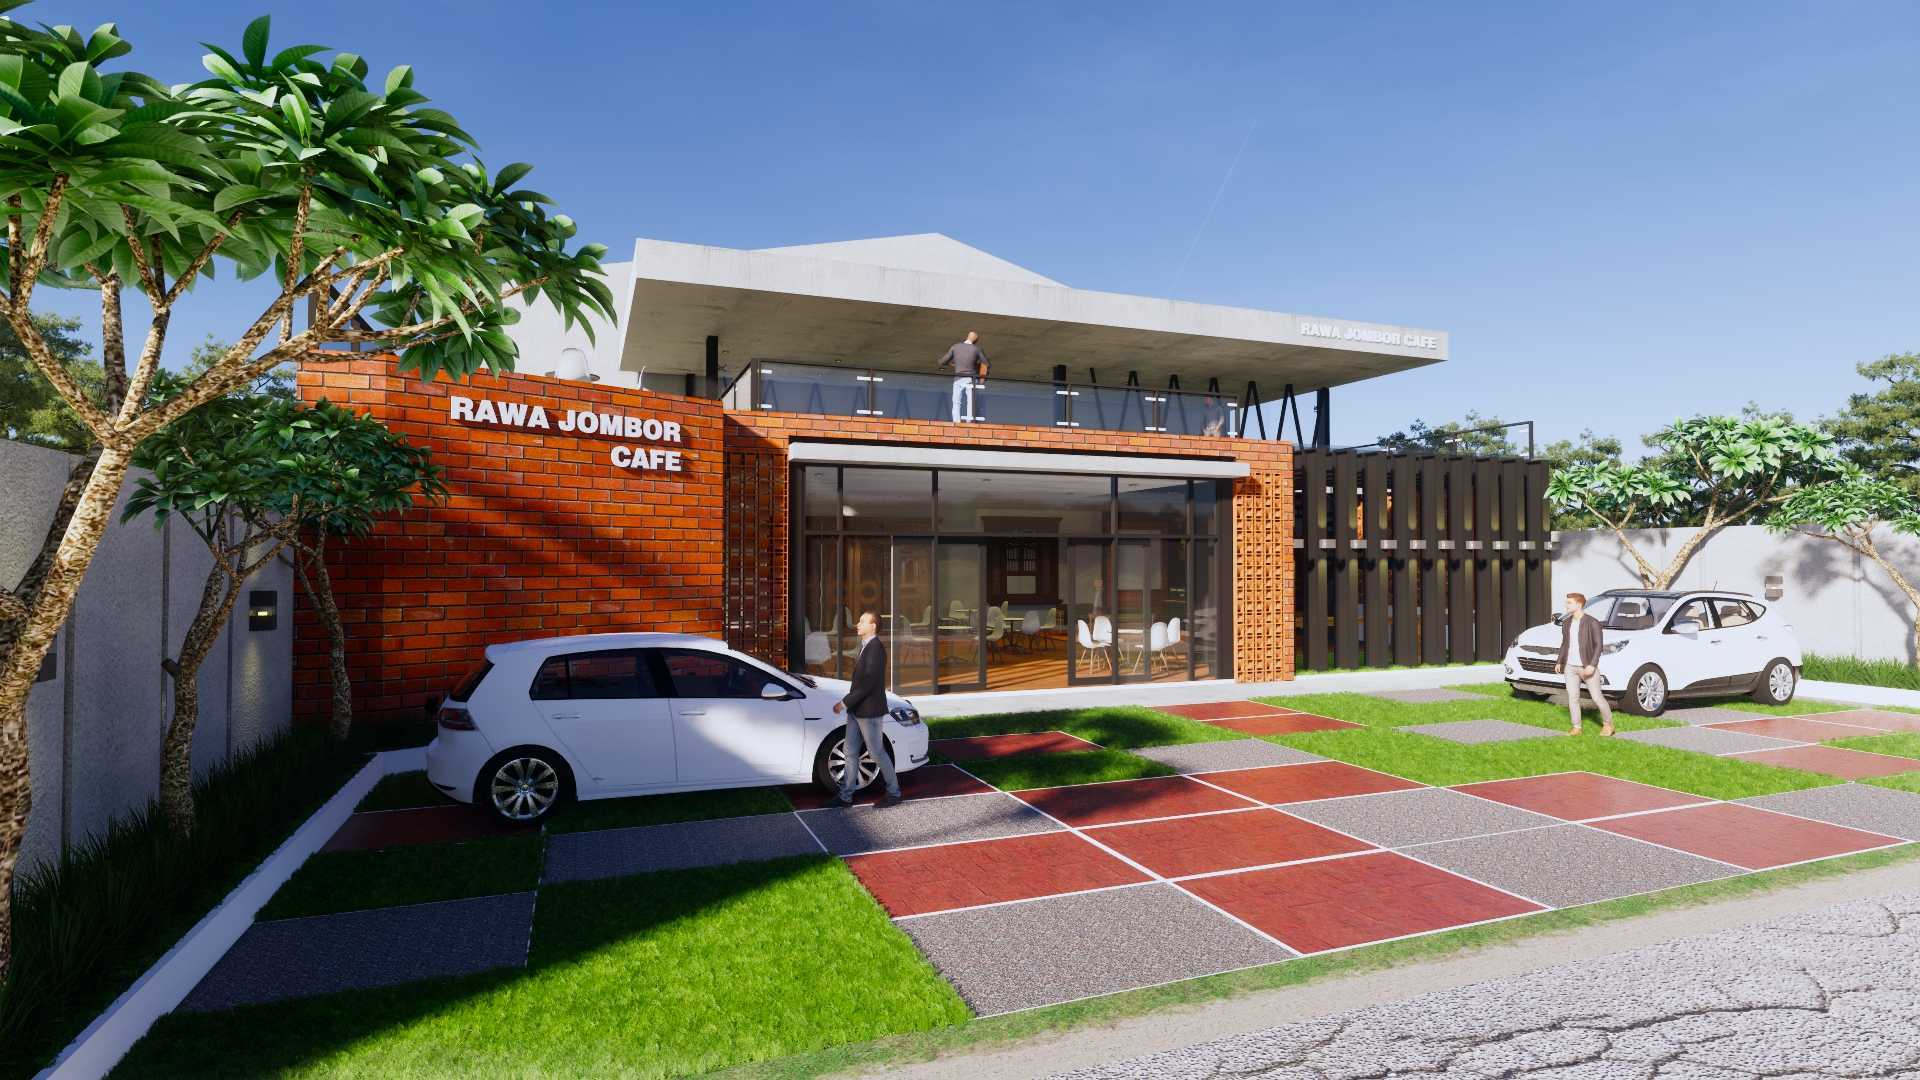 Jasa Arsitek Chans Architect di Sleman